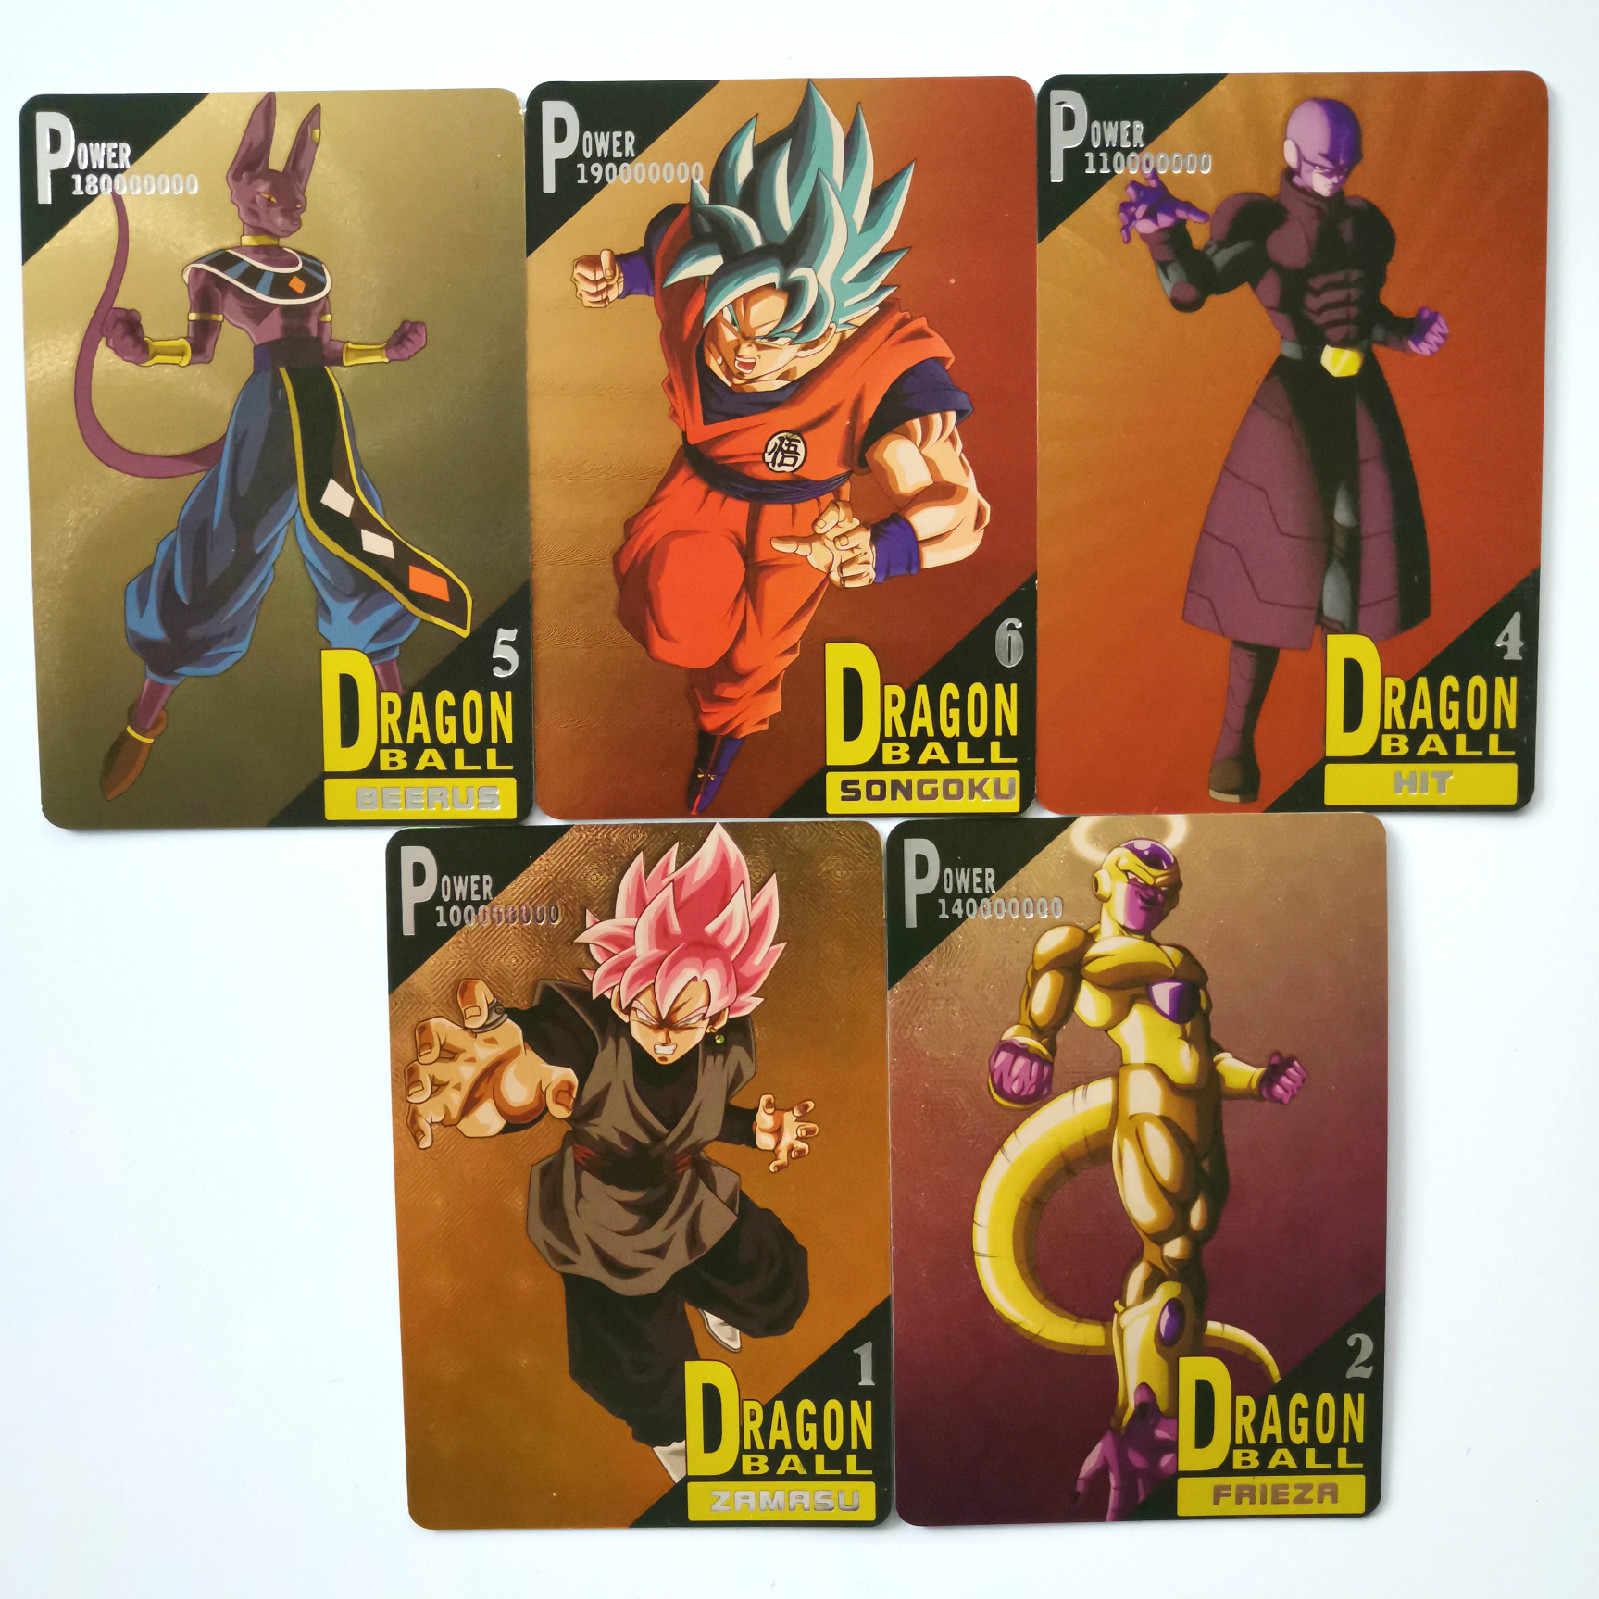 32pcs Super Dragon Ball Z Only 20 Sets Heroes Battle Card Gogeta Ultra Instinct Goku Vegeta Game Collection Anime Cards